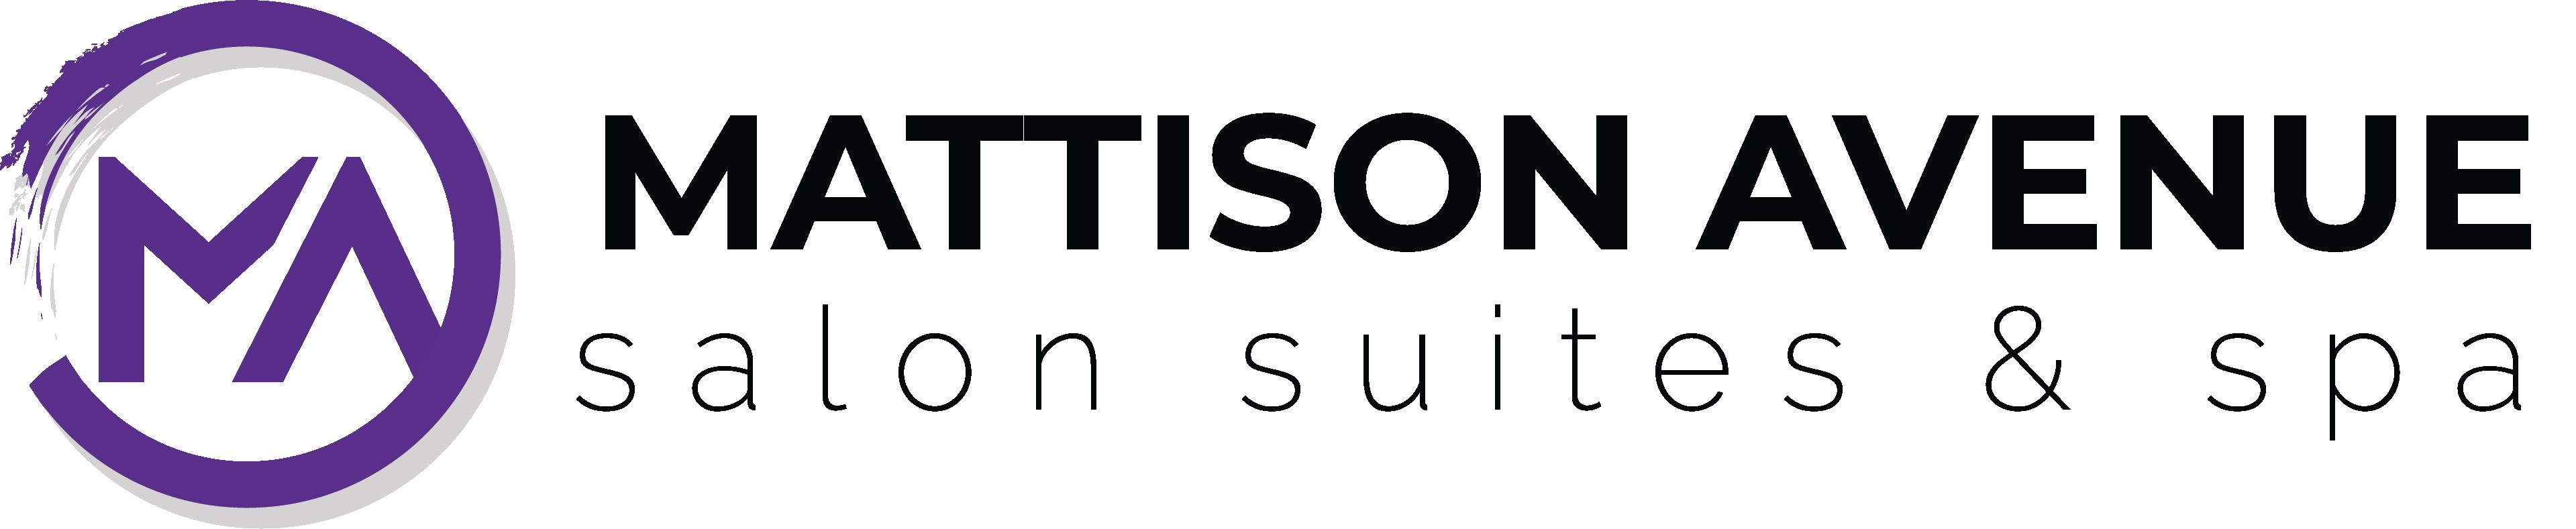 Mattison Avenue Salon Suites and Spa logo.